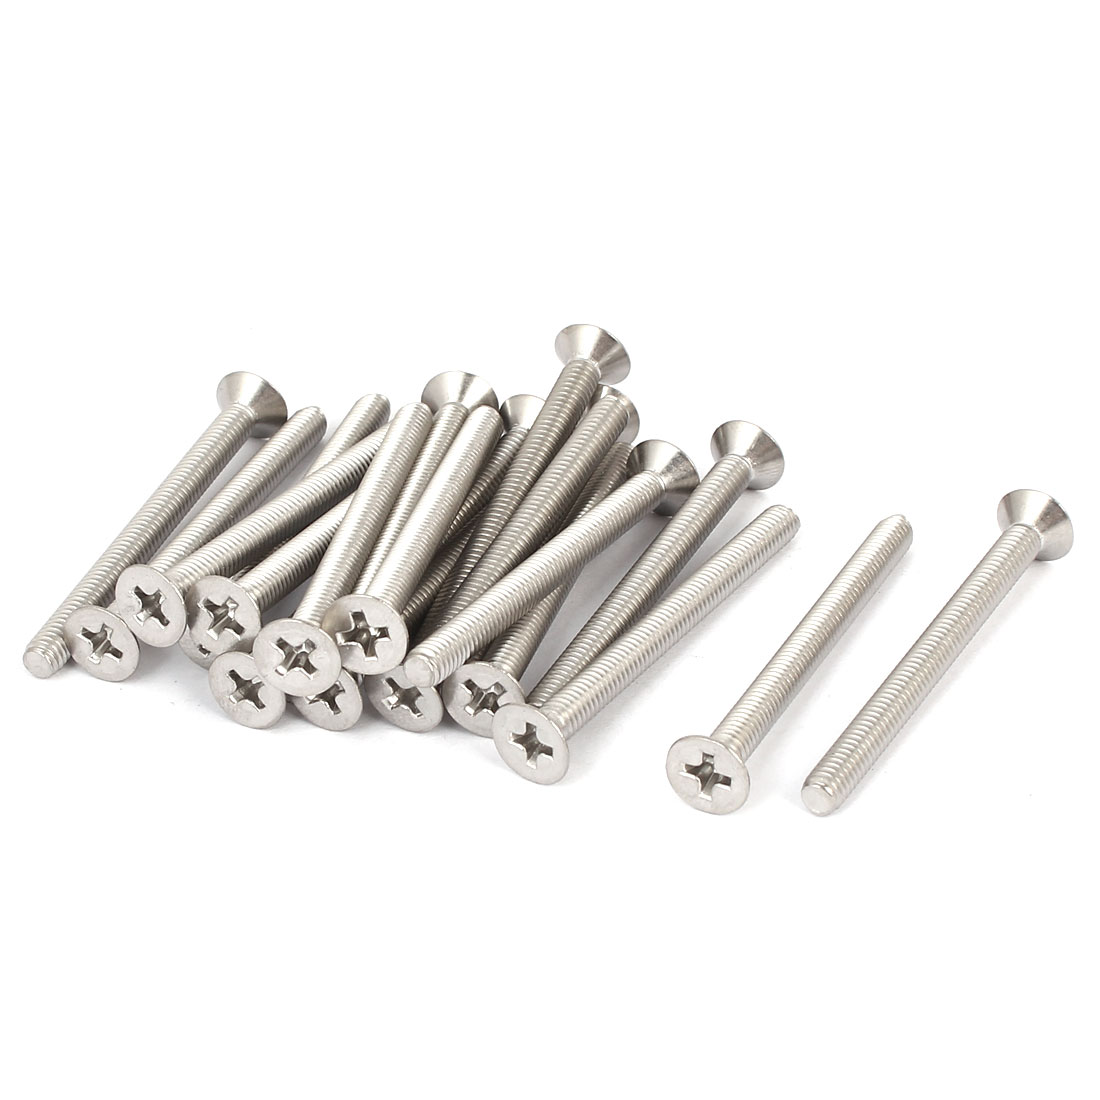 20 Pcs M4x45mm 316 Stainless Steel Flat Head Phillips Machine Screws Fasteners